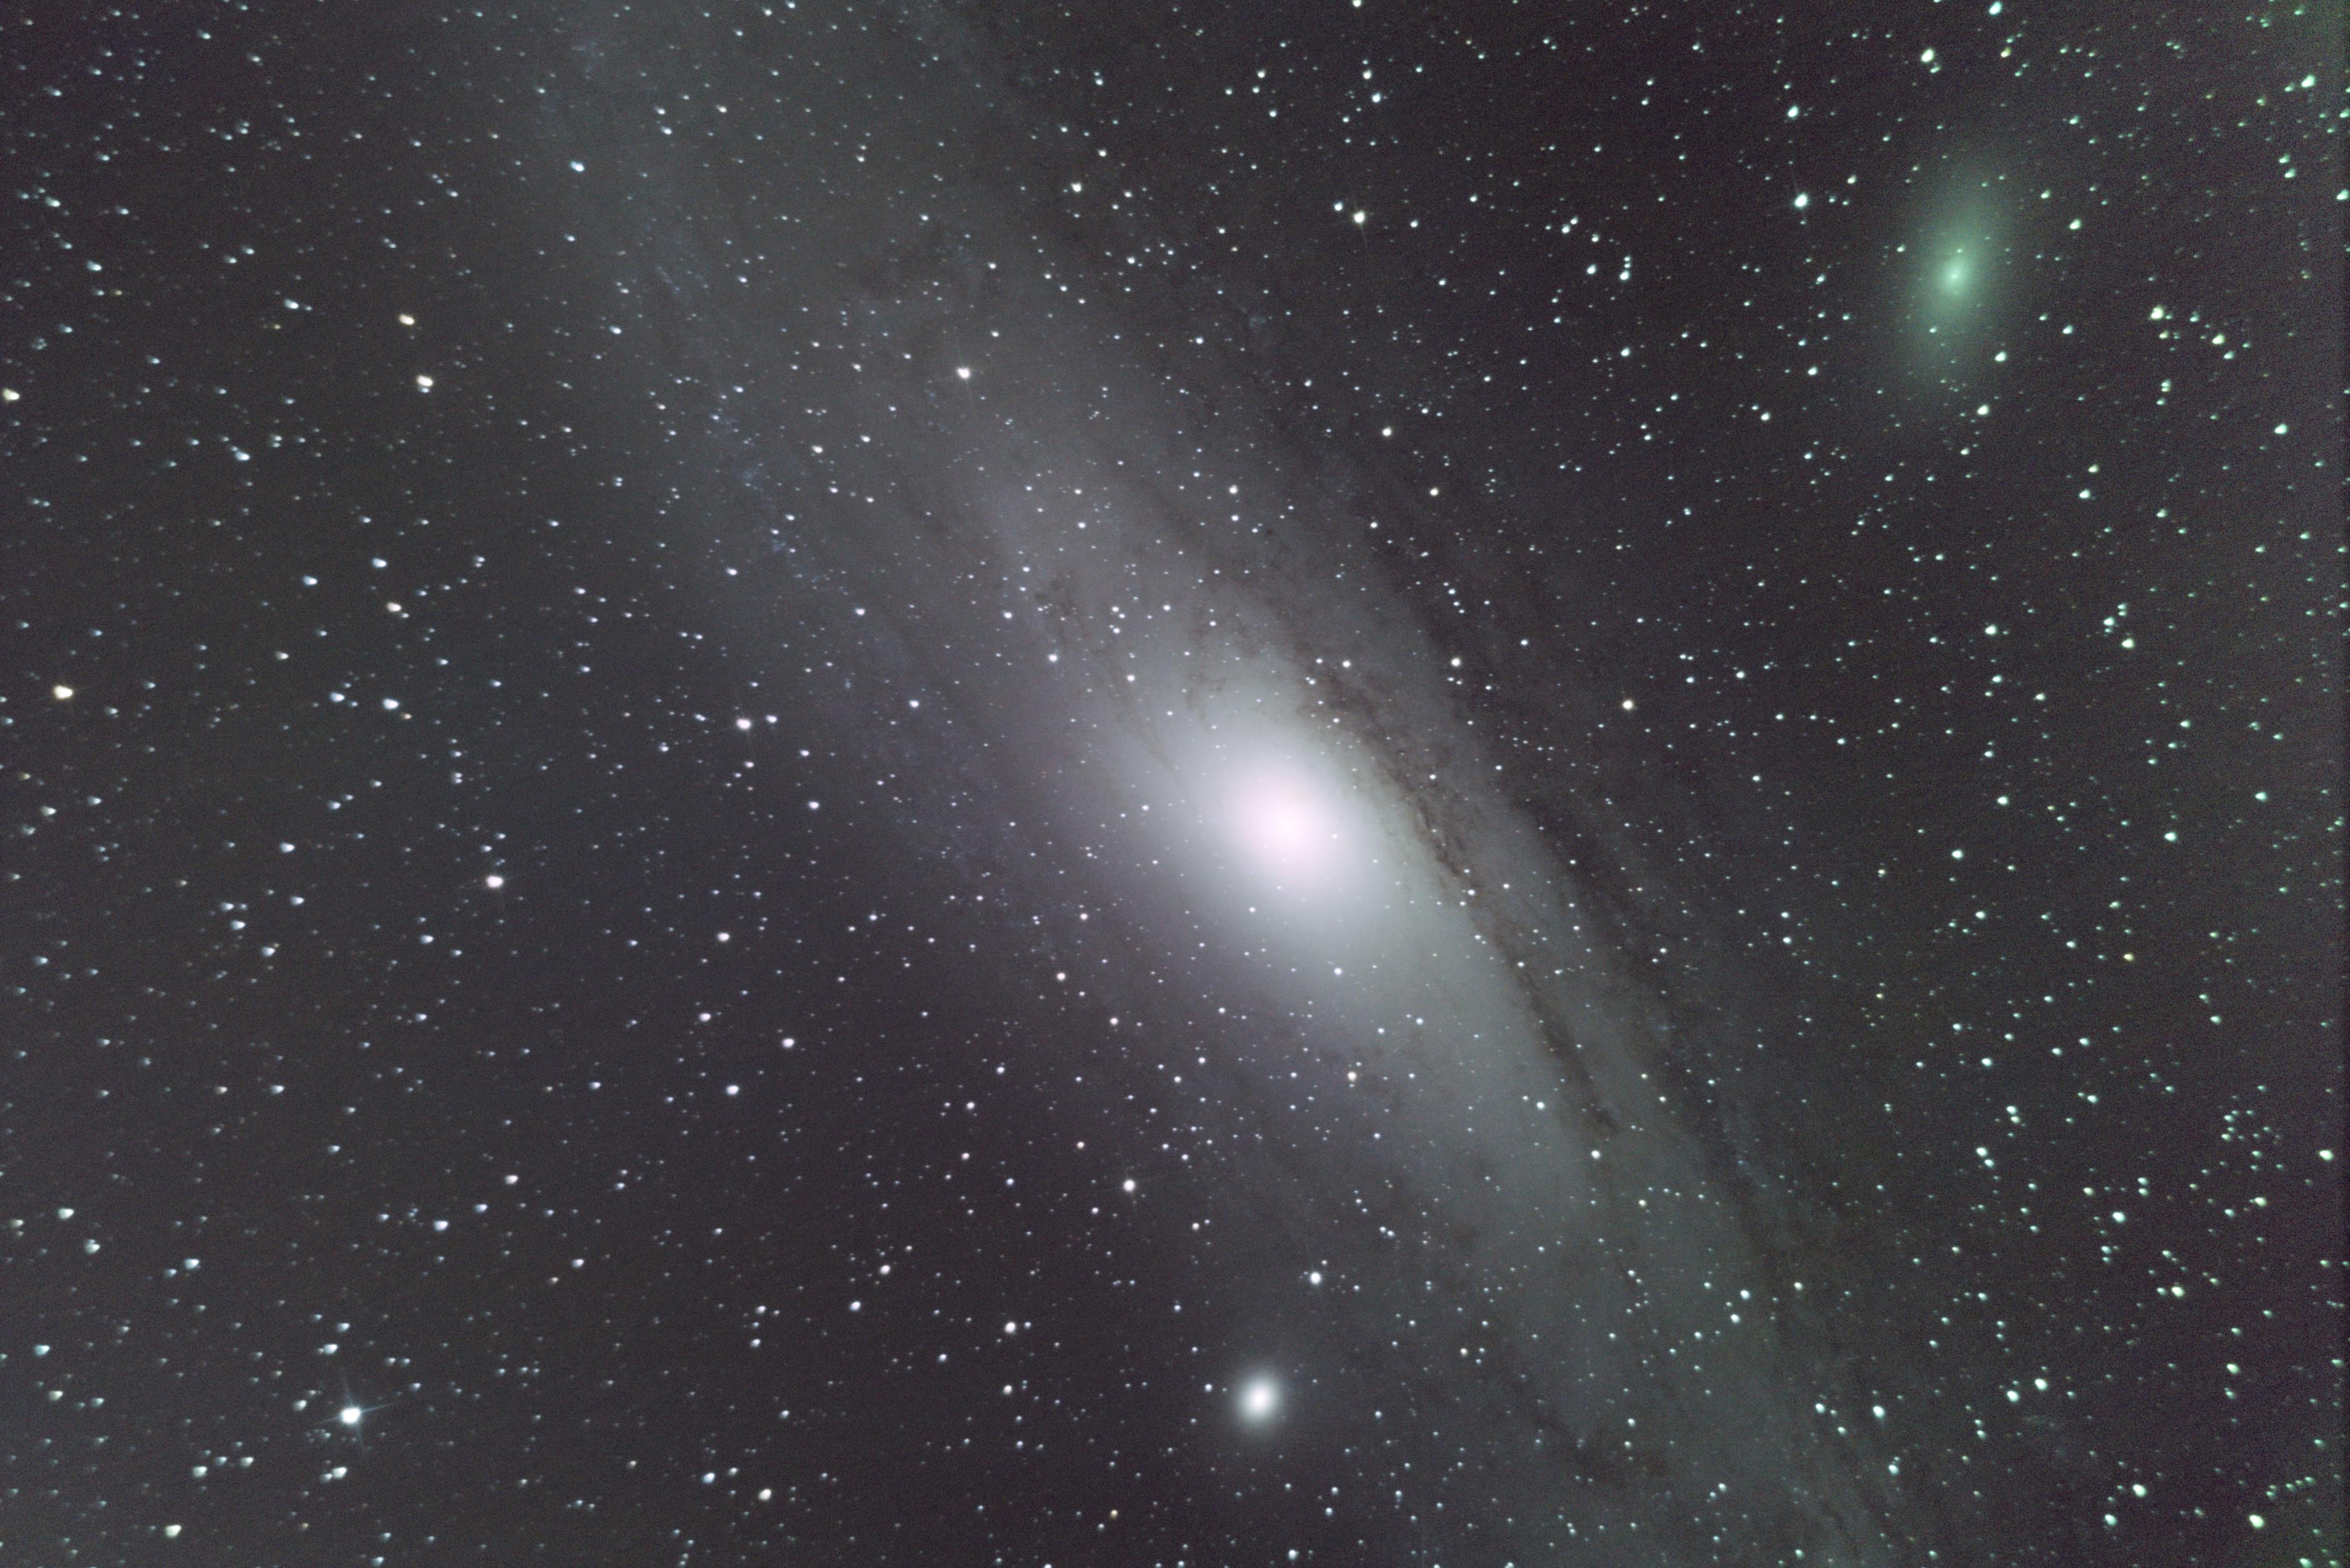 M31 Galaxie d'Andromède M31-0010G0040R